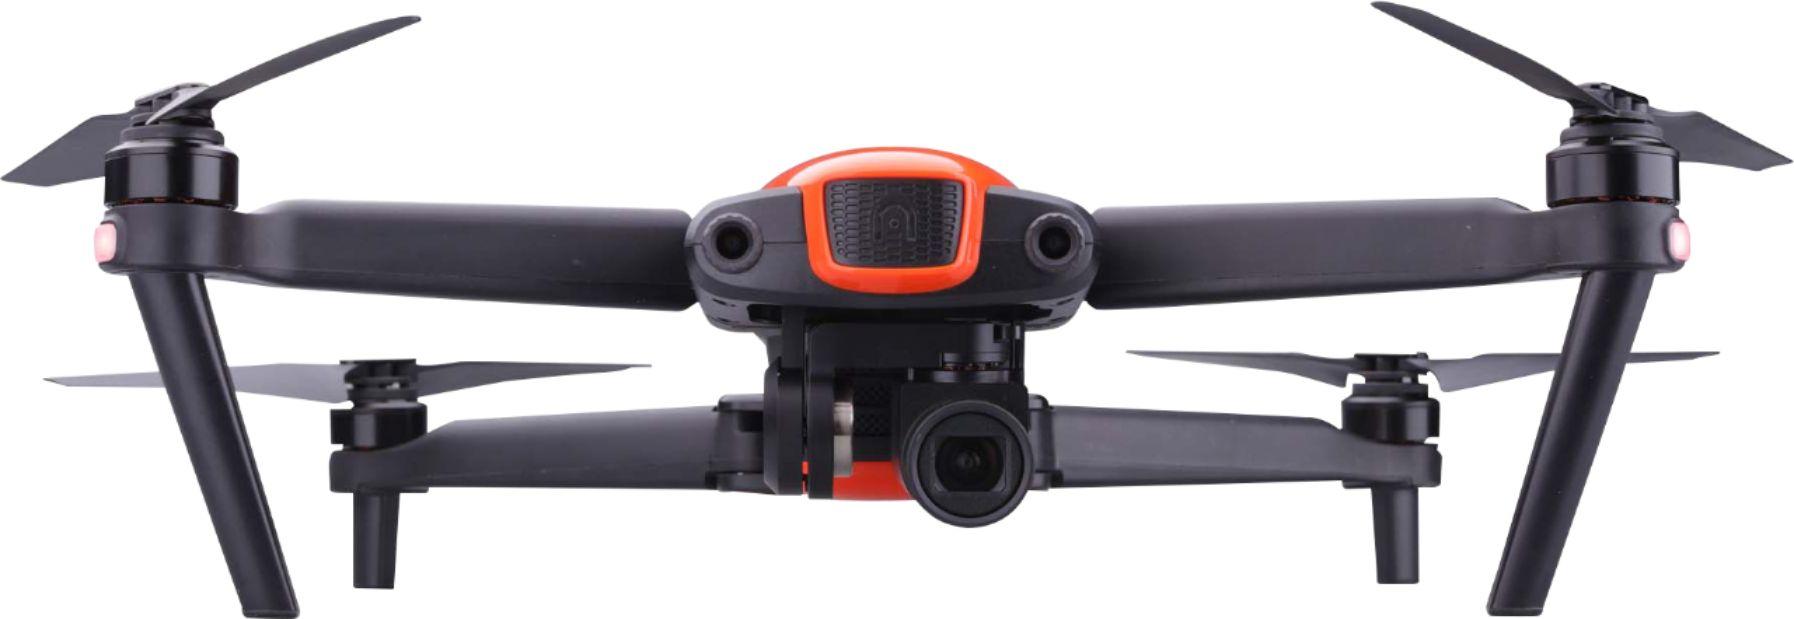 Autel Robotics - EVO 4K Drone